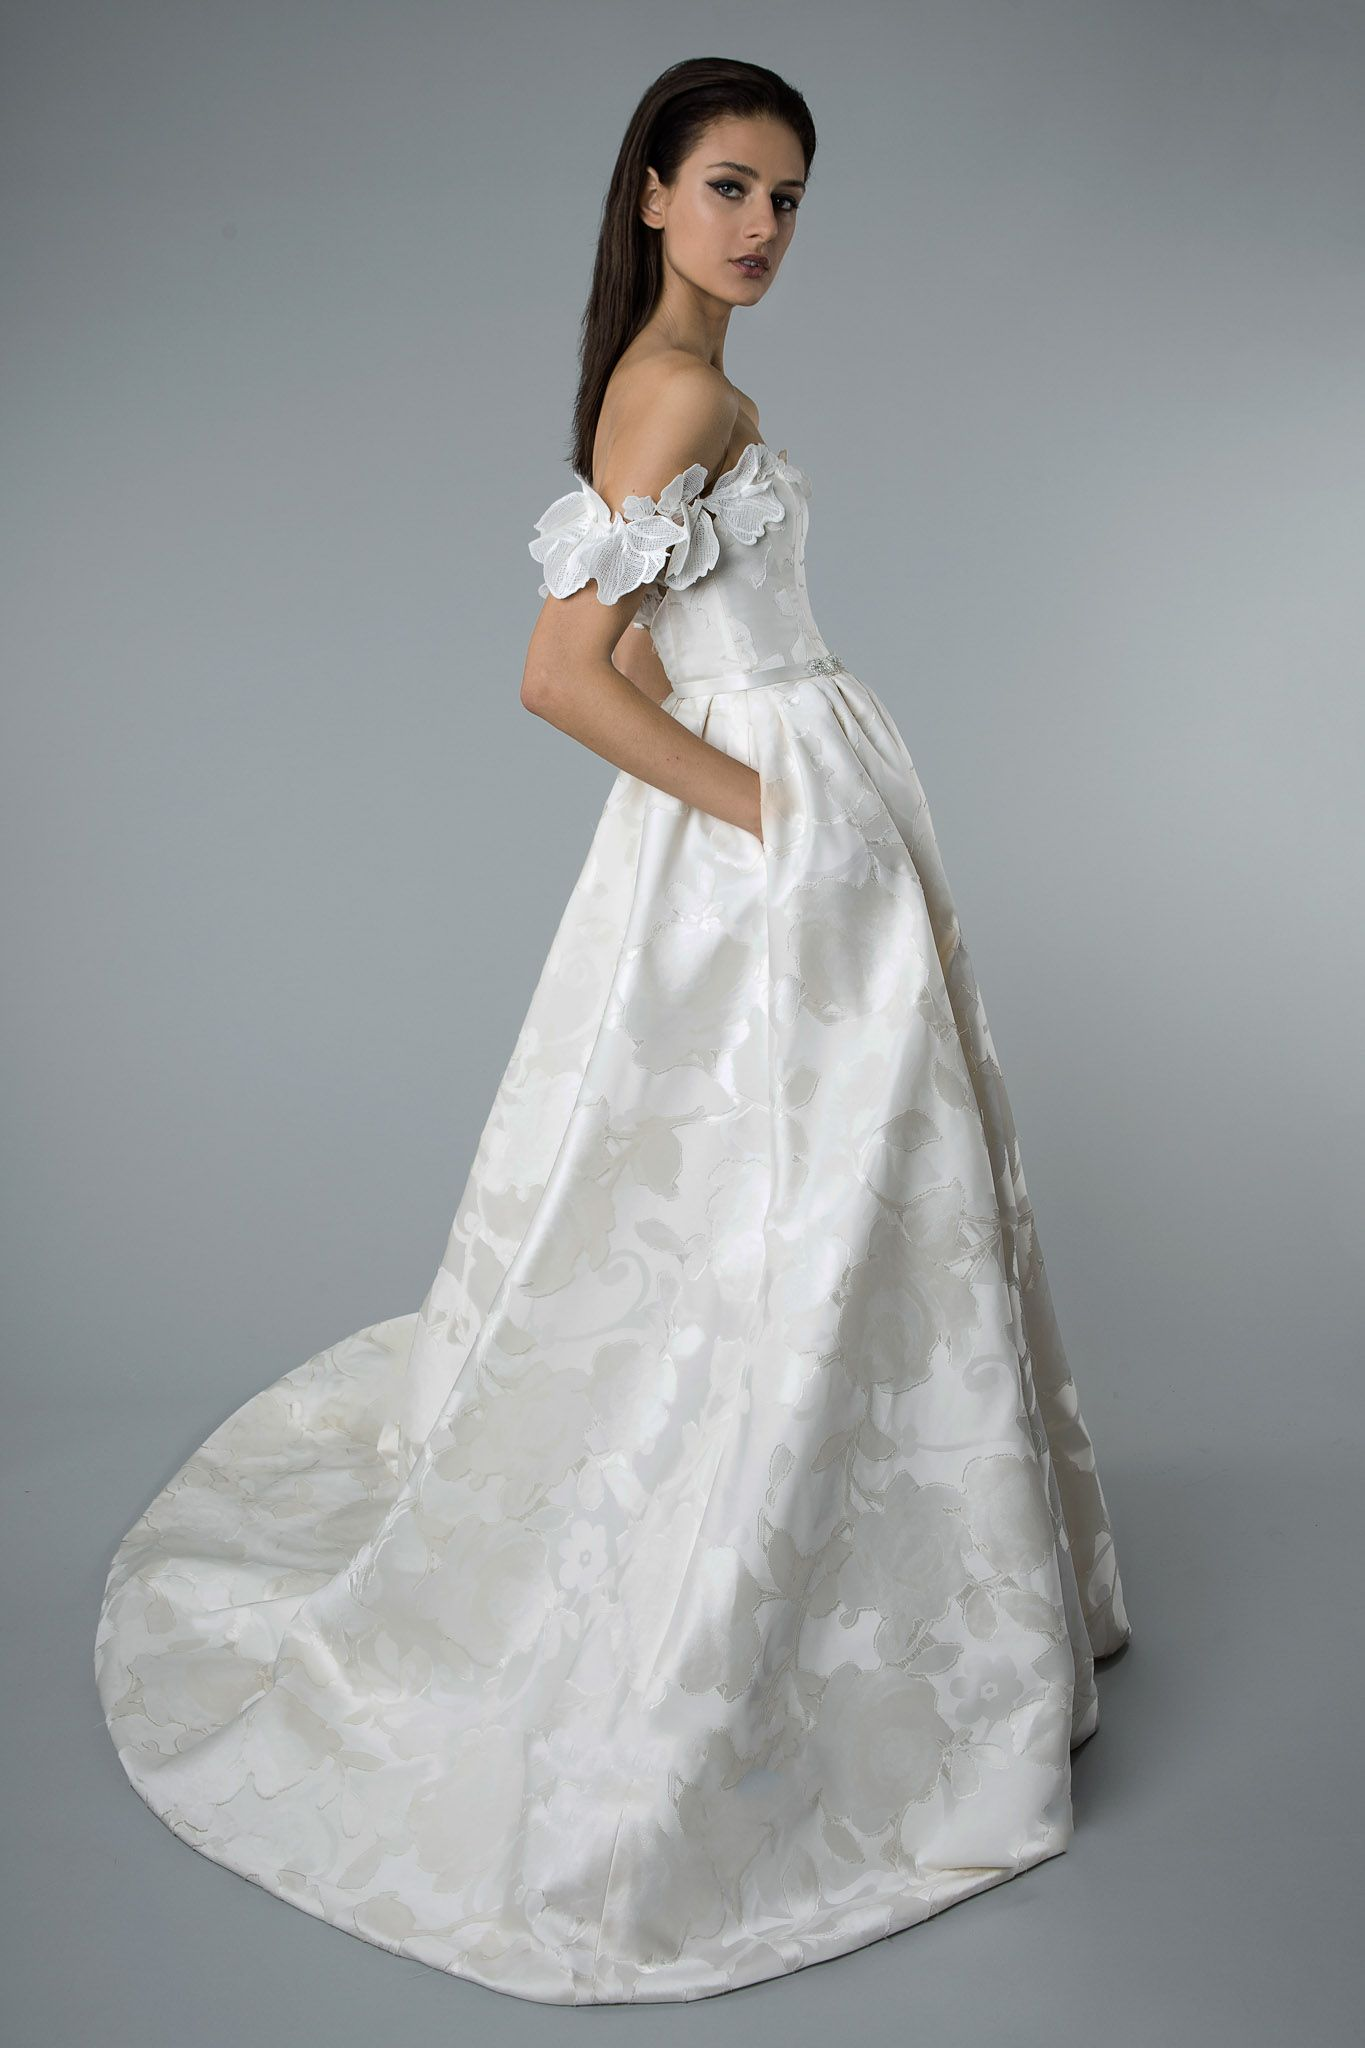 fafcb640085 Mira Zwillinger Harmonie wedding dress - Browns Bride